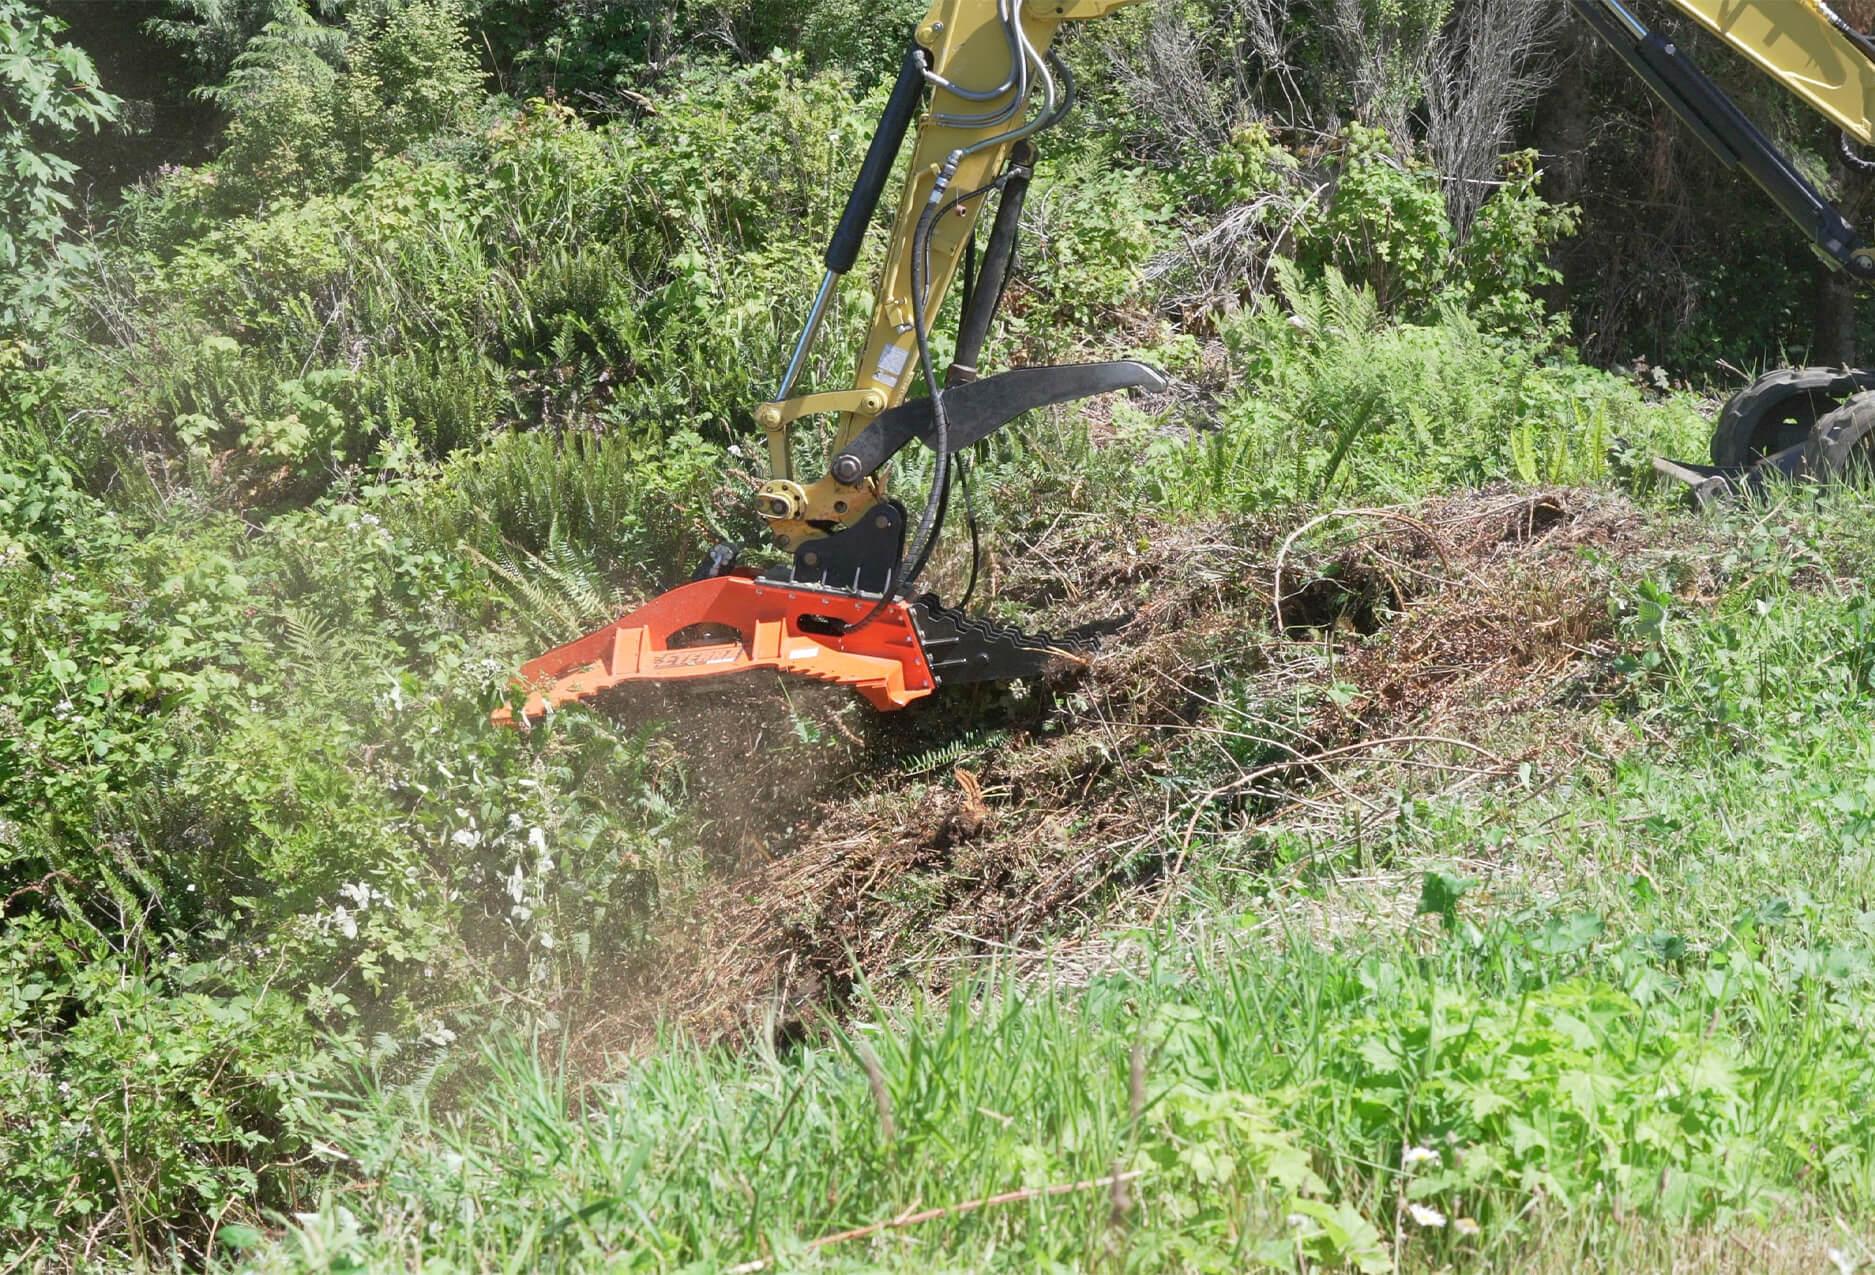 "The cyclone 60"" rotary brush mower clearing brush on a hillside."